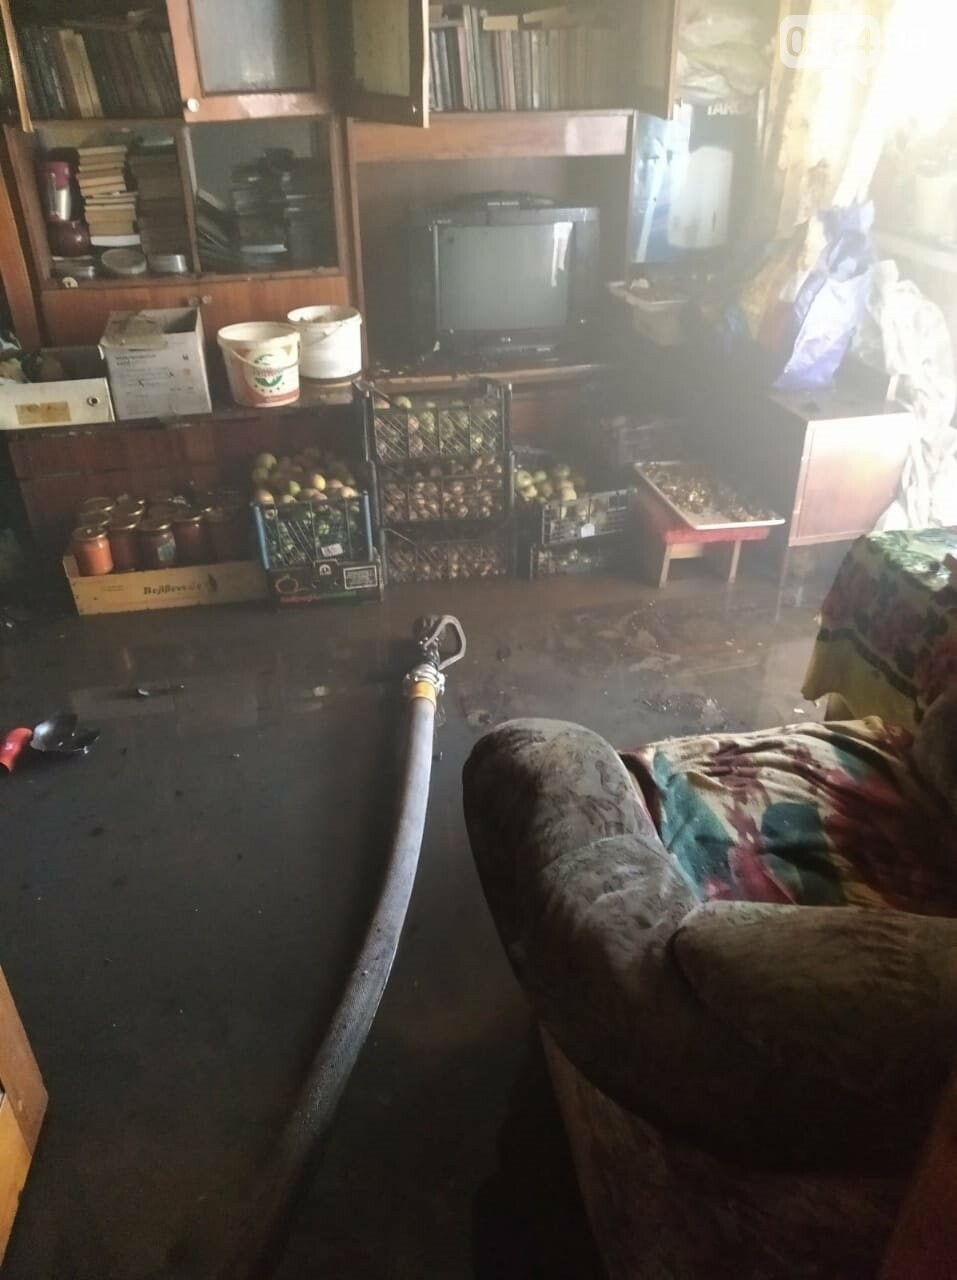 В Кривом Роге на пожаре в многоэтажке погиб 31-летний мужчина, - ФОТО, фото-1